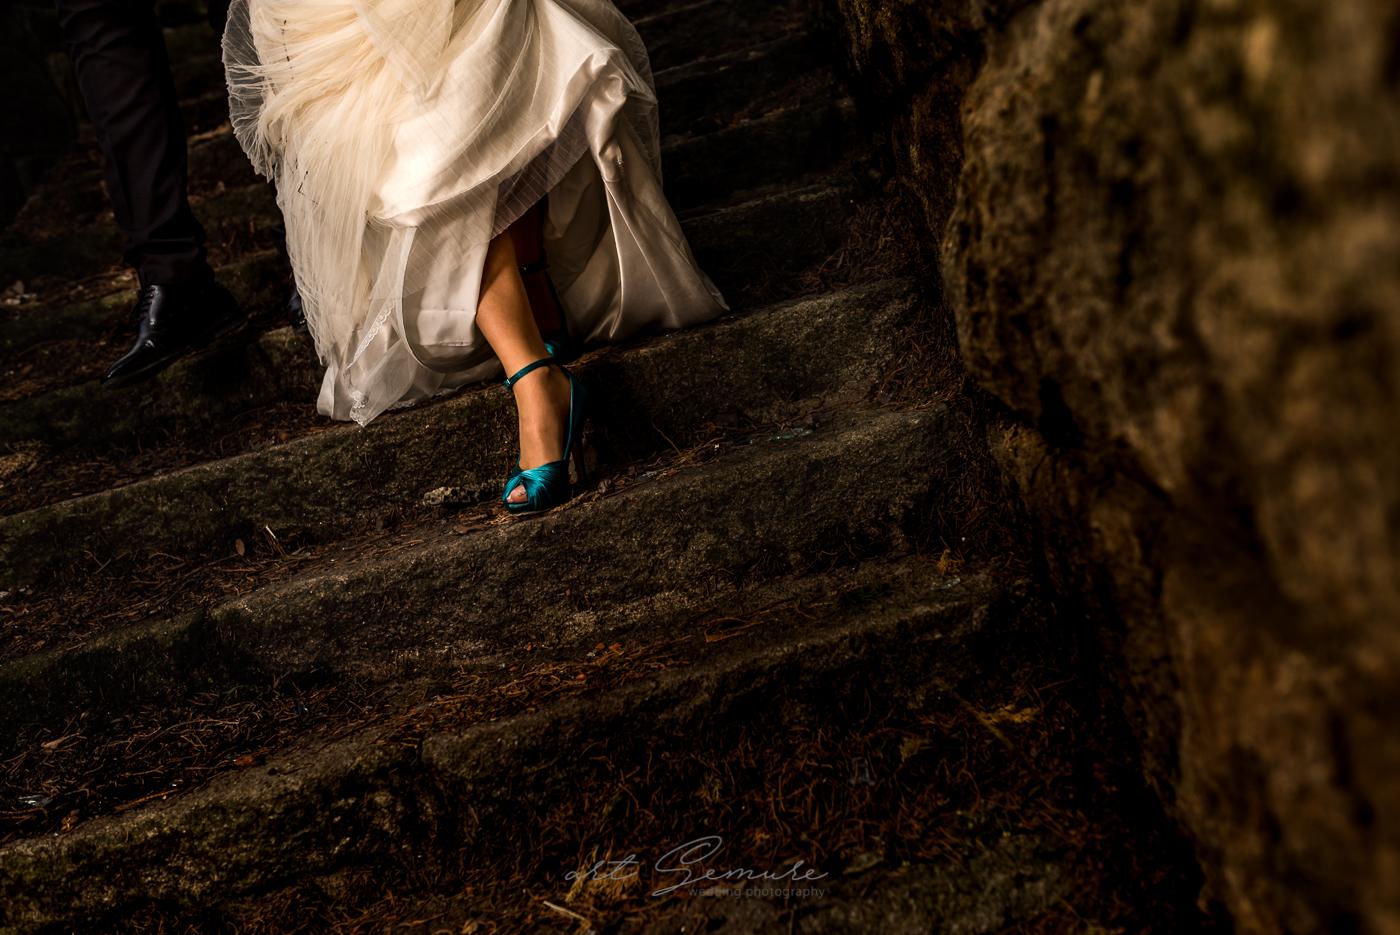 fotografo boda emotiva zamora salto de castro 10_